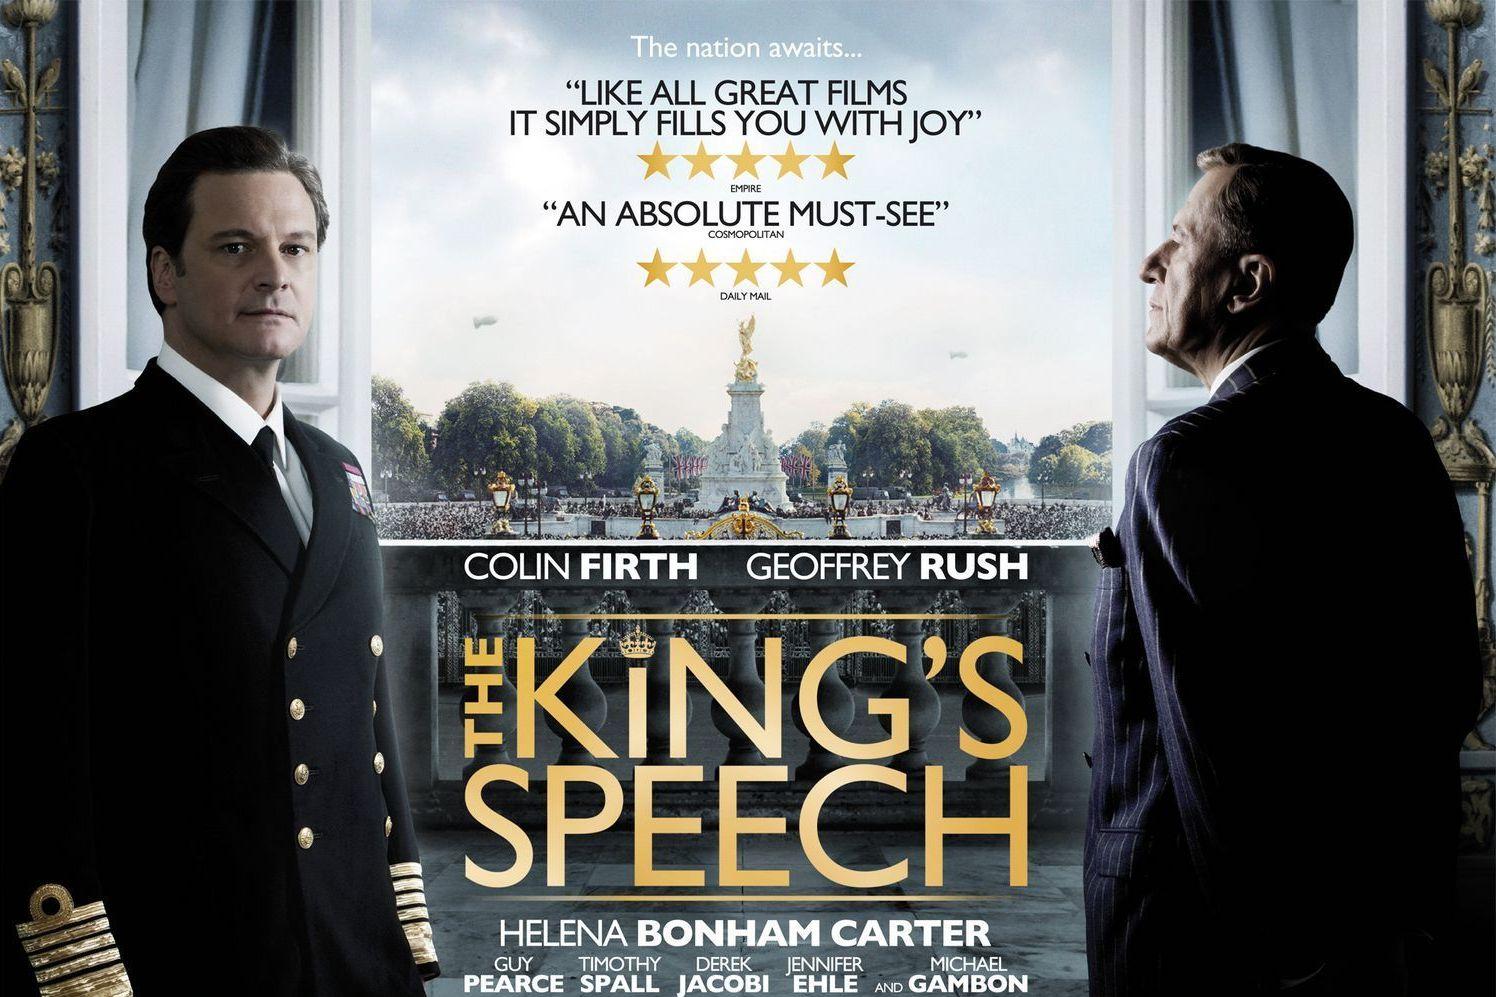 The-King-s-Speech-the-kings-speech-20512621-1500-1125